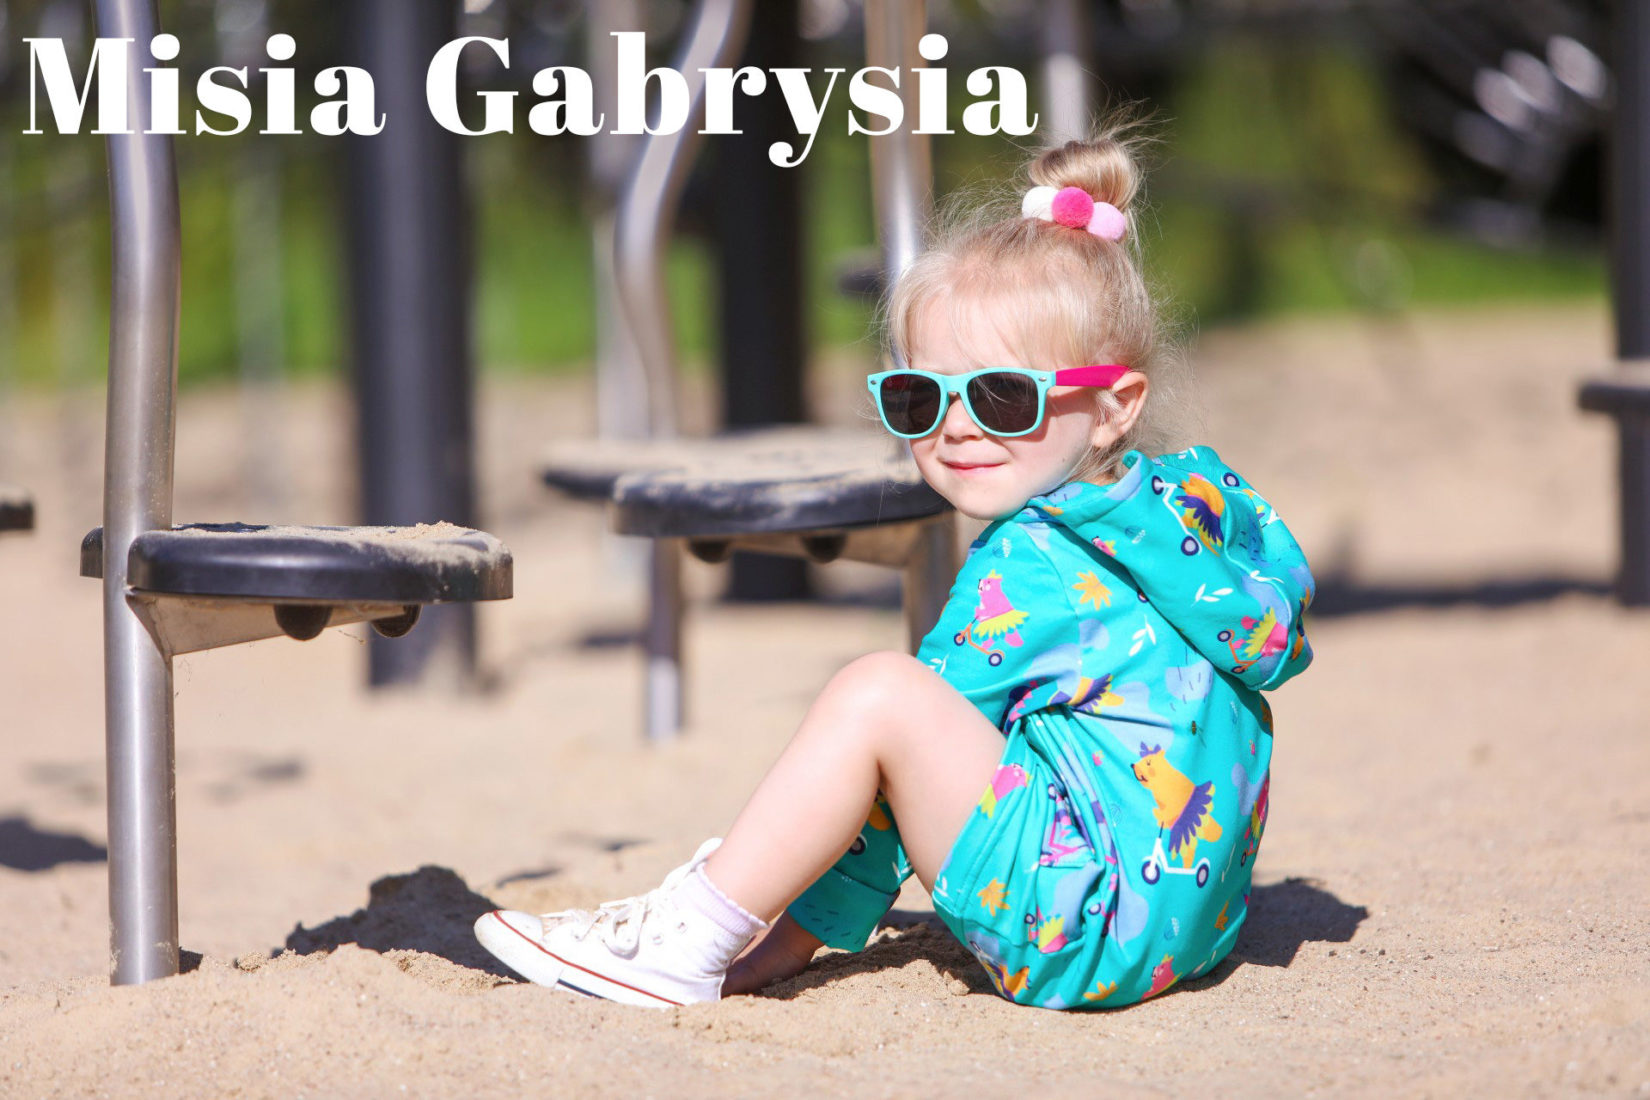 Misia Gabrysia